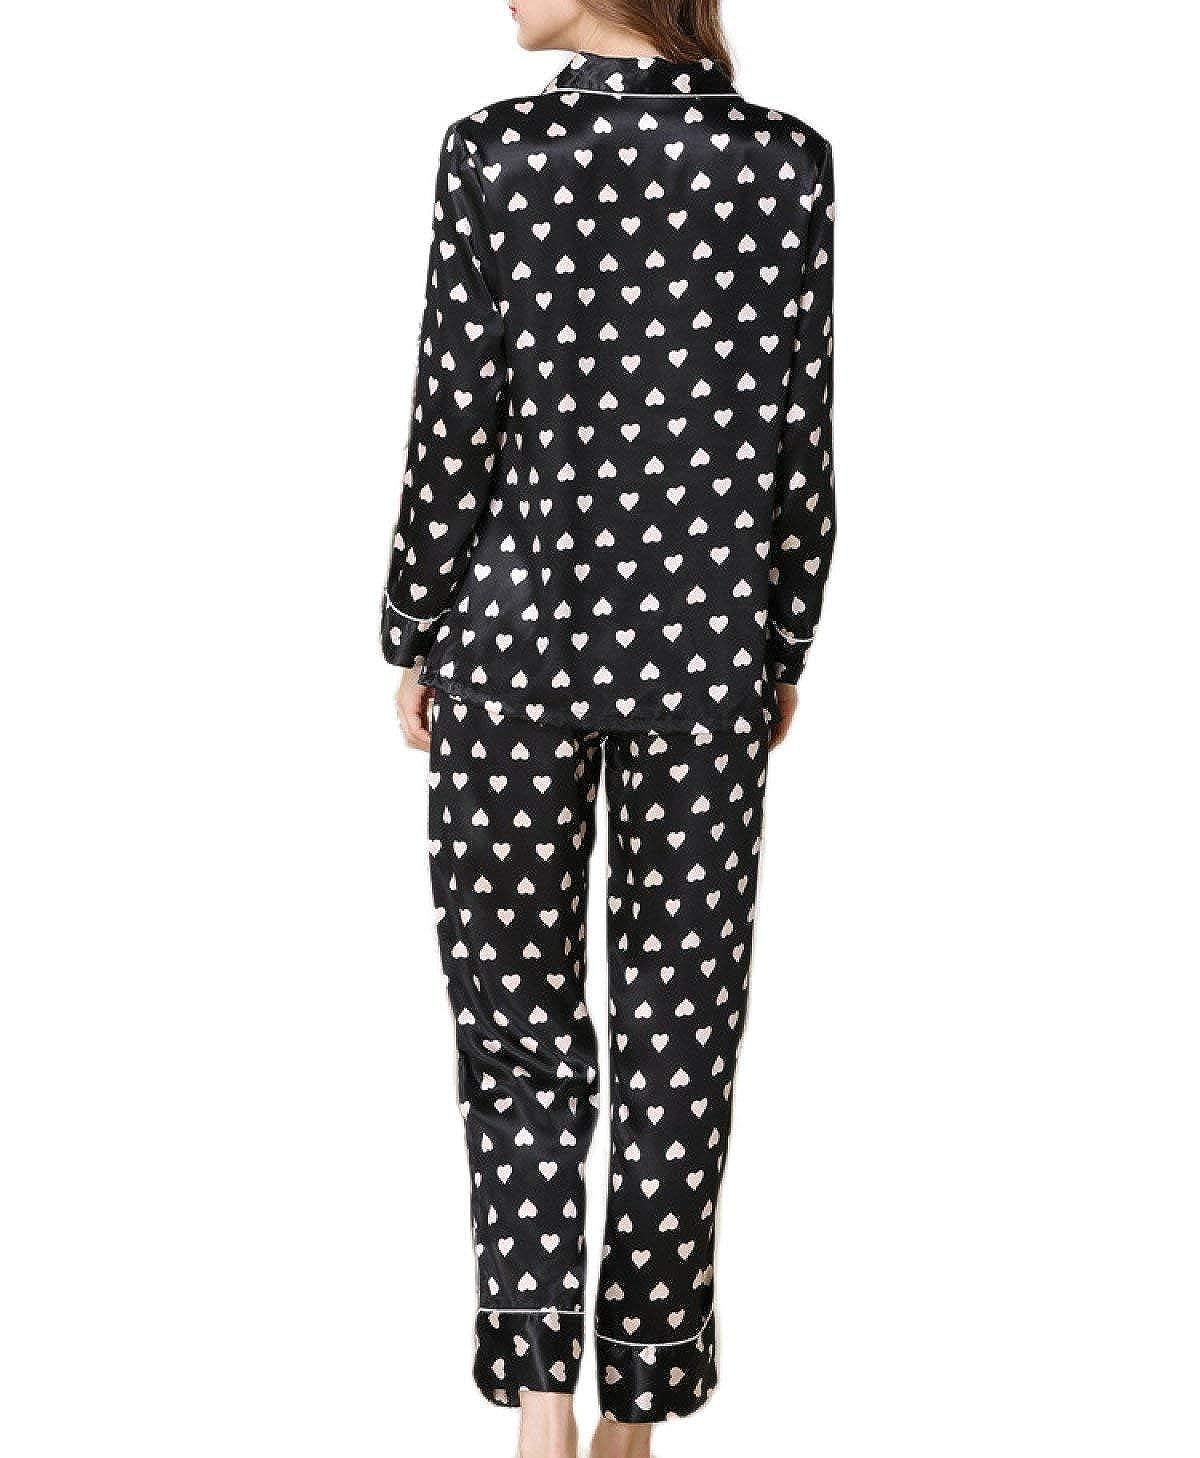 Mujer Ropa De Noche Elegante Chic Manga Larga Estampadas V-Cuello Button Conjunto De Pijama Primavera Vintage Otoño Satín Batas Fashion Ropa De Dormir ...